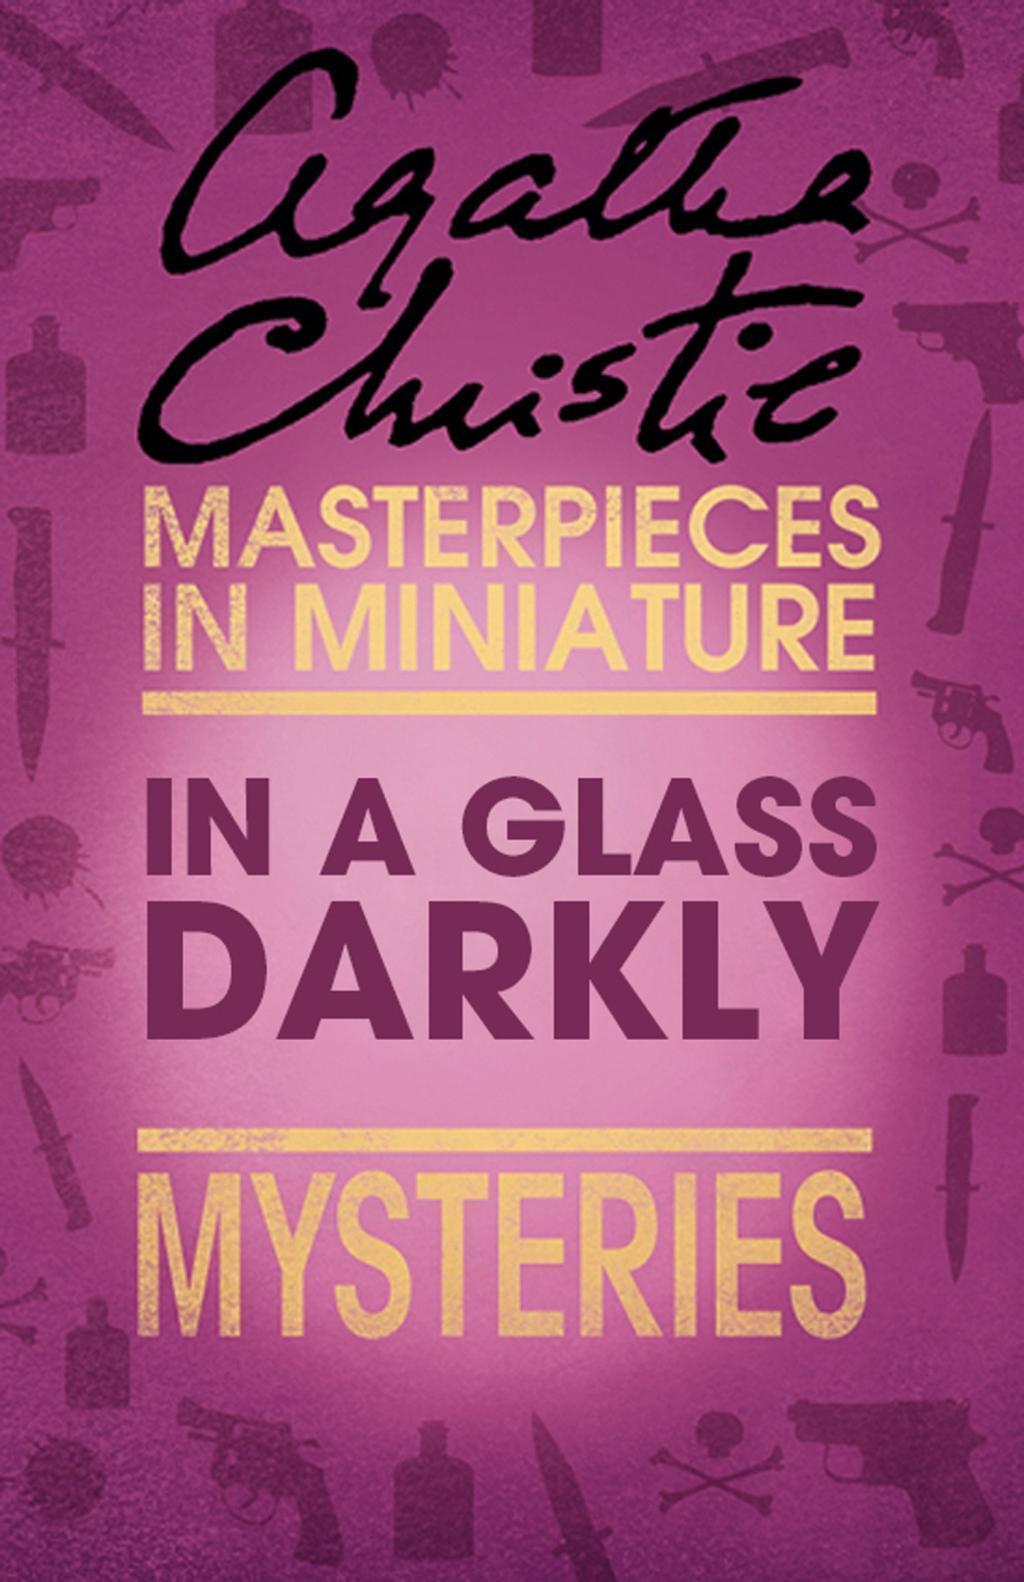 In a Glass Darkly: An Agatha Christie Short Story